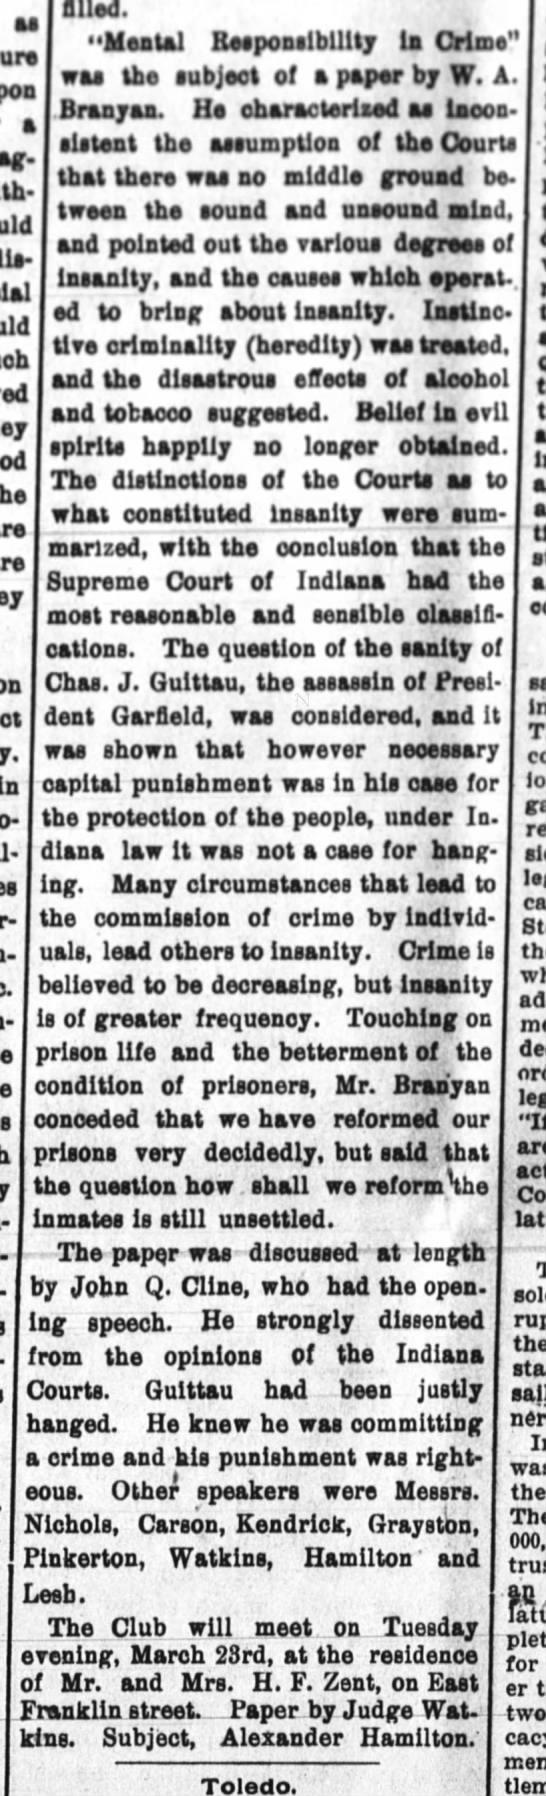 Mental responsibility in crime 3.12.1897 -